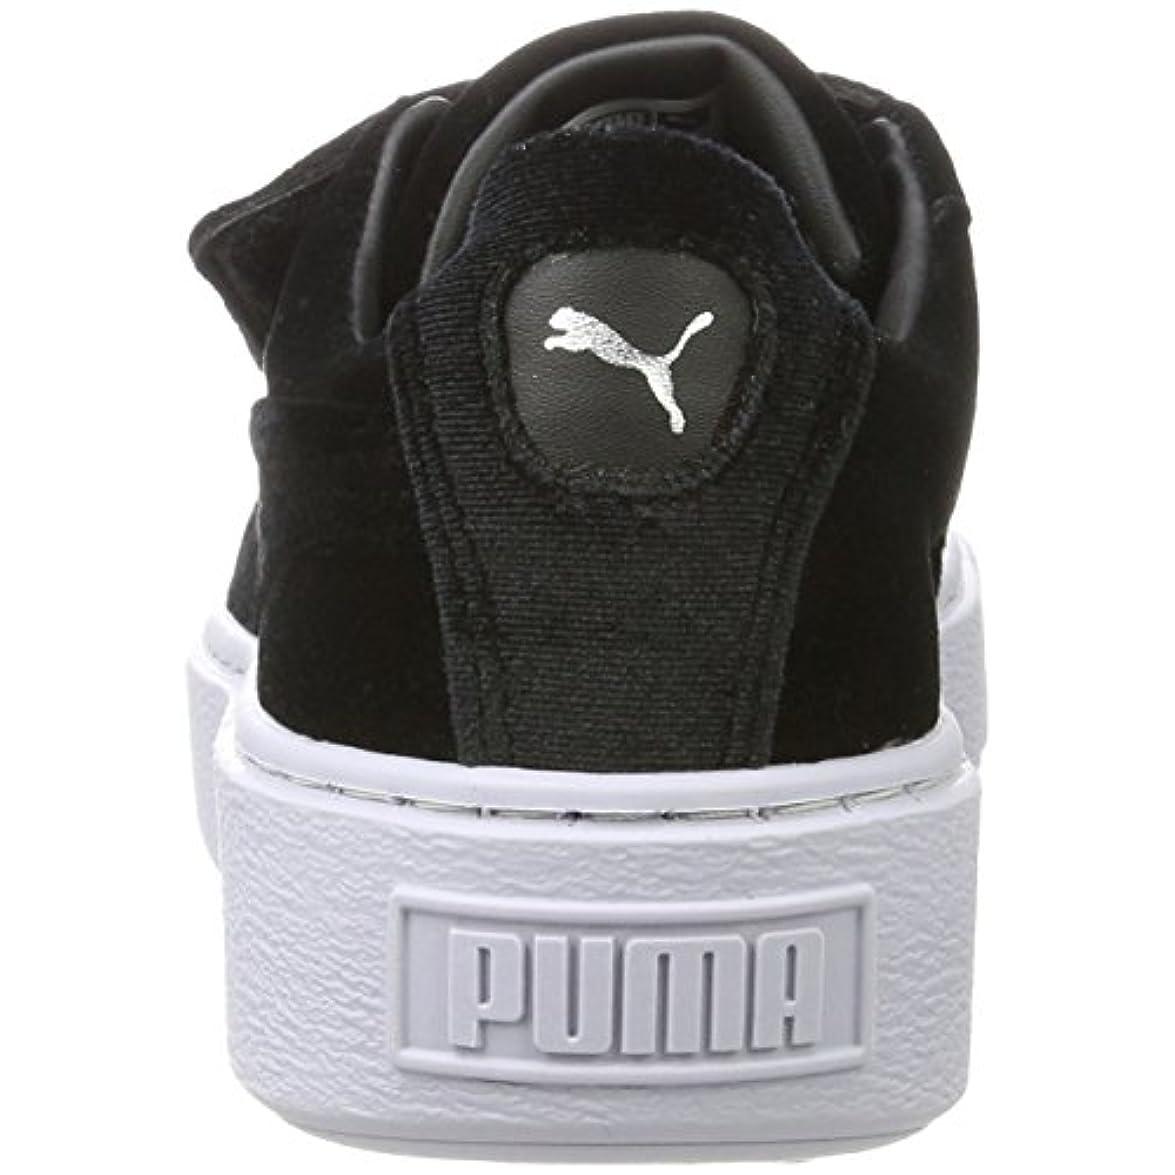 Puma Basket Platform Strapvr Scarpe Da Ginnastica Basse Donna